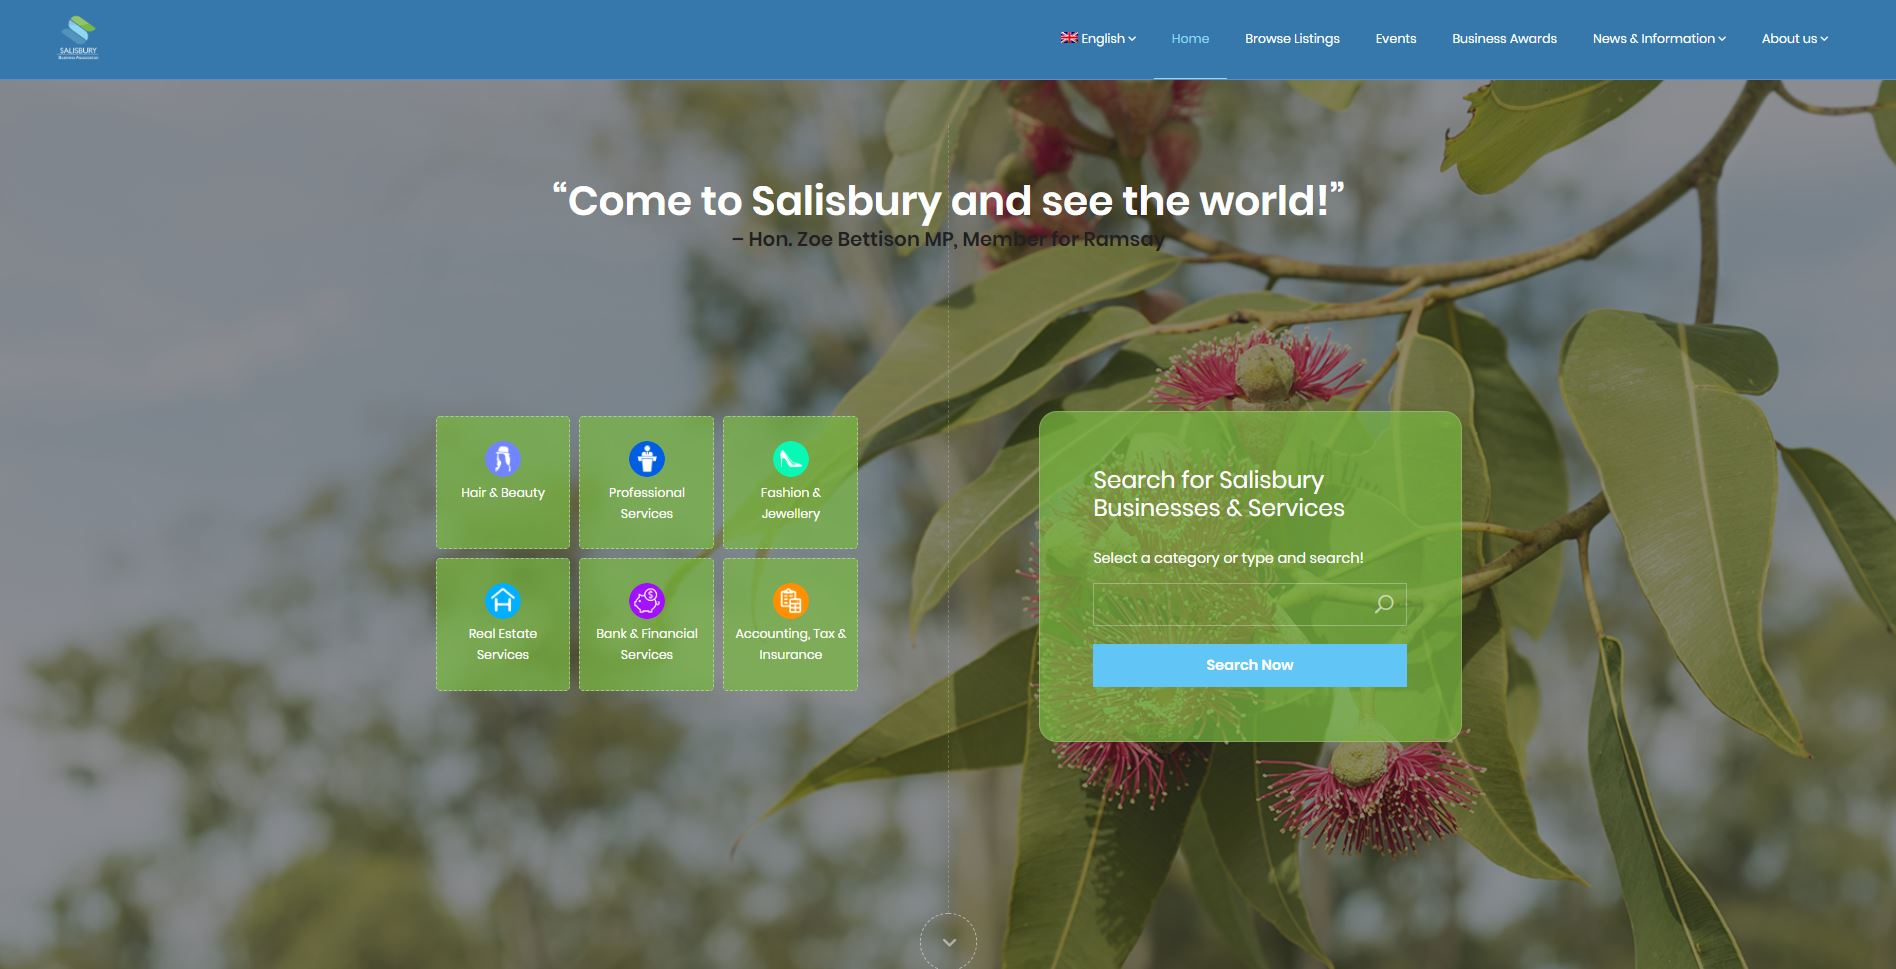 Salisbury Business Association